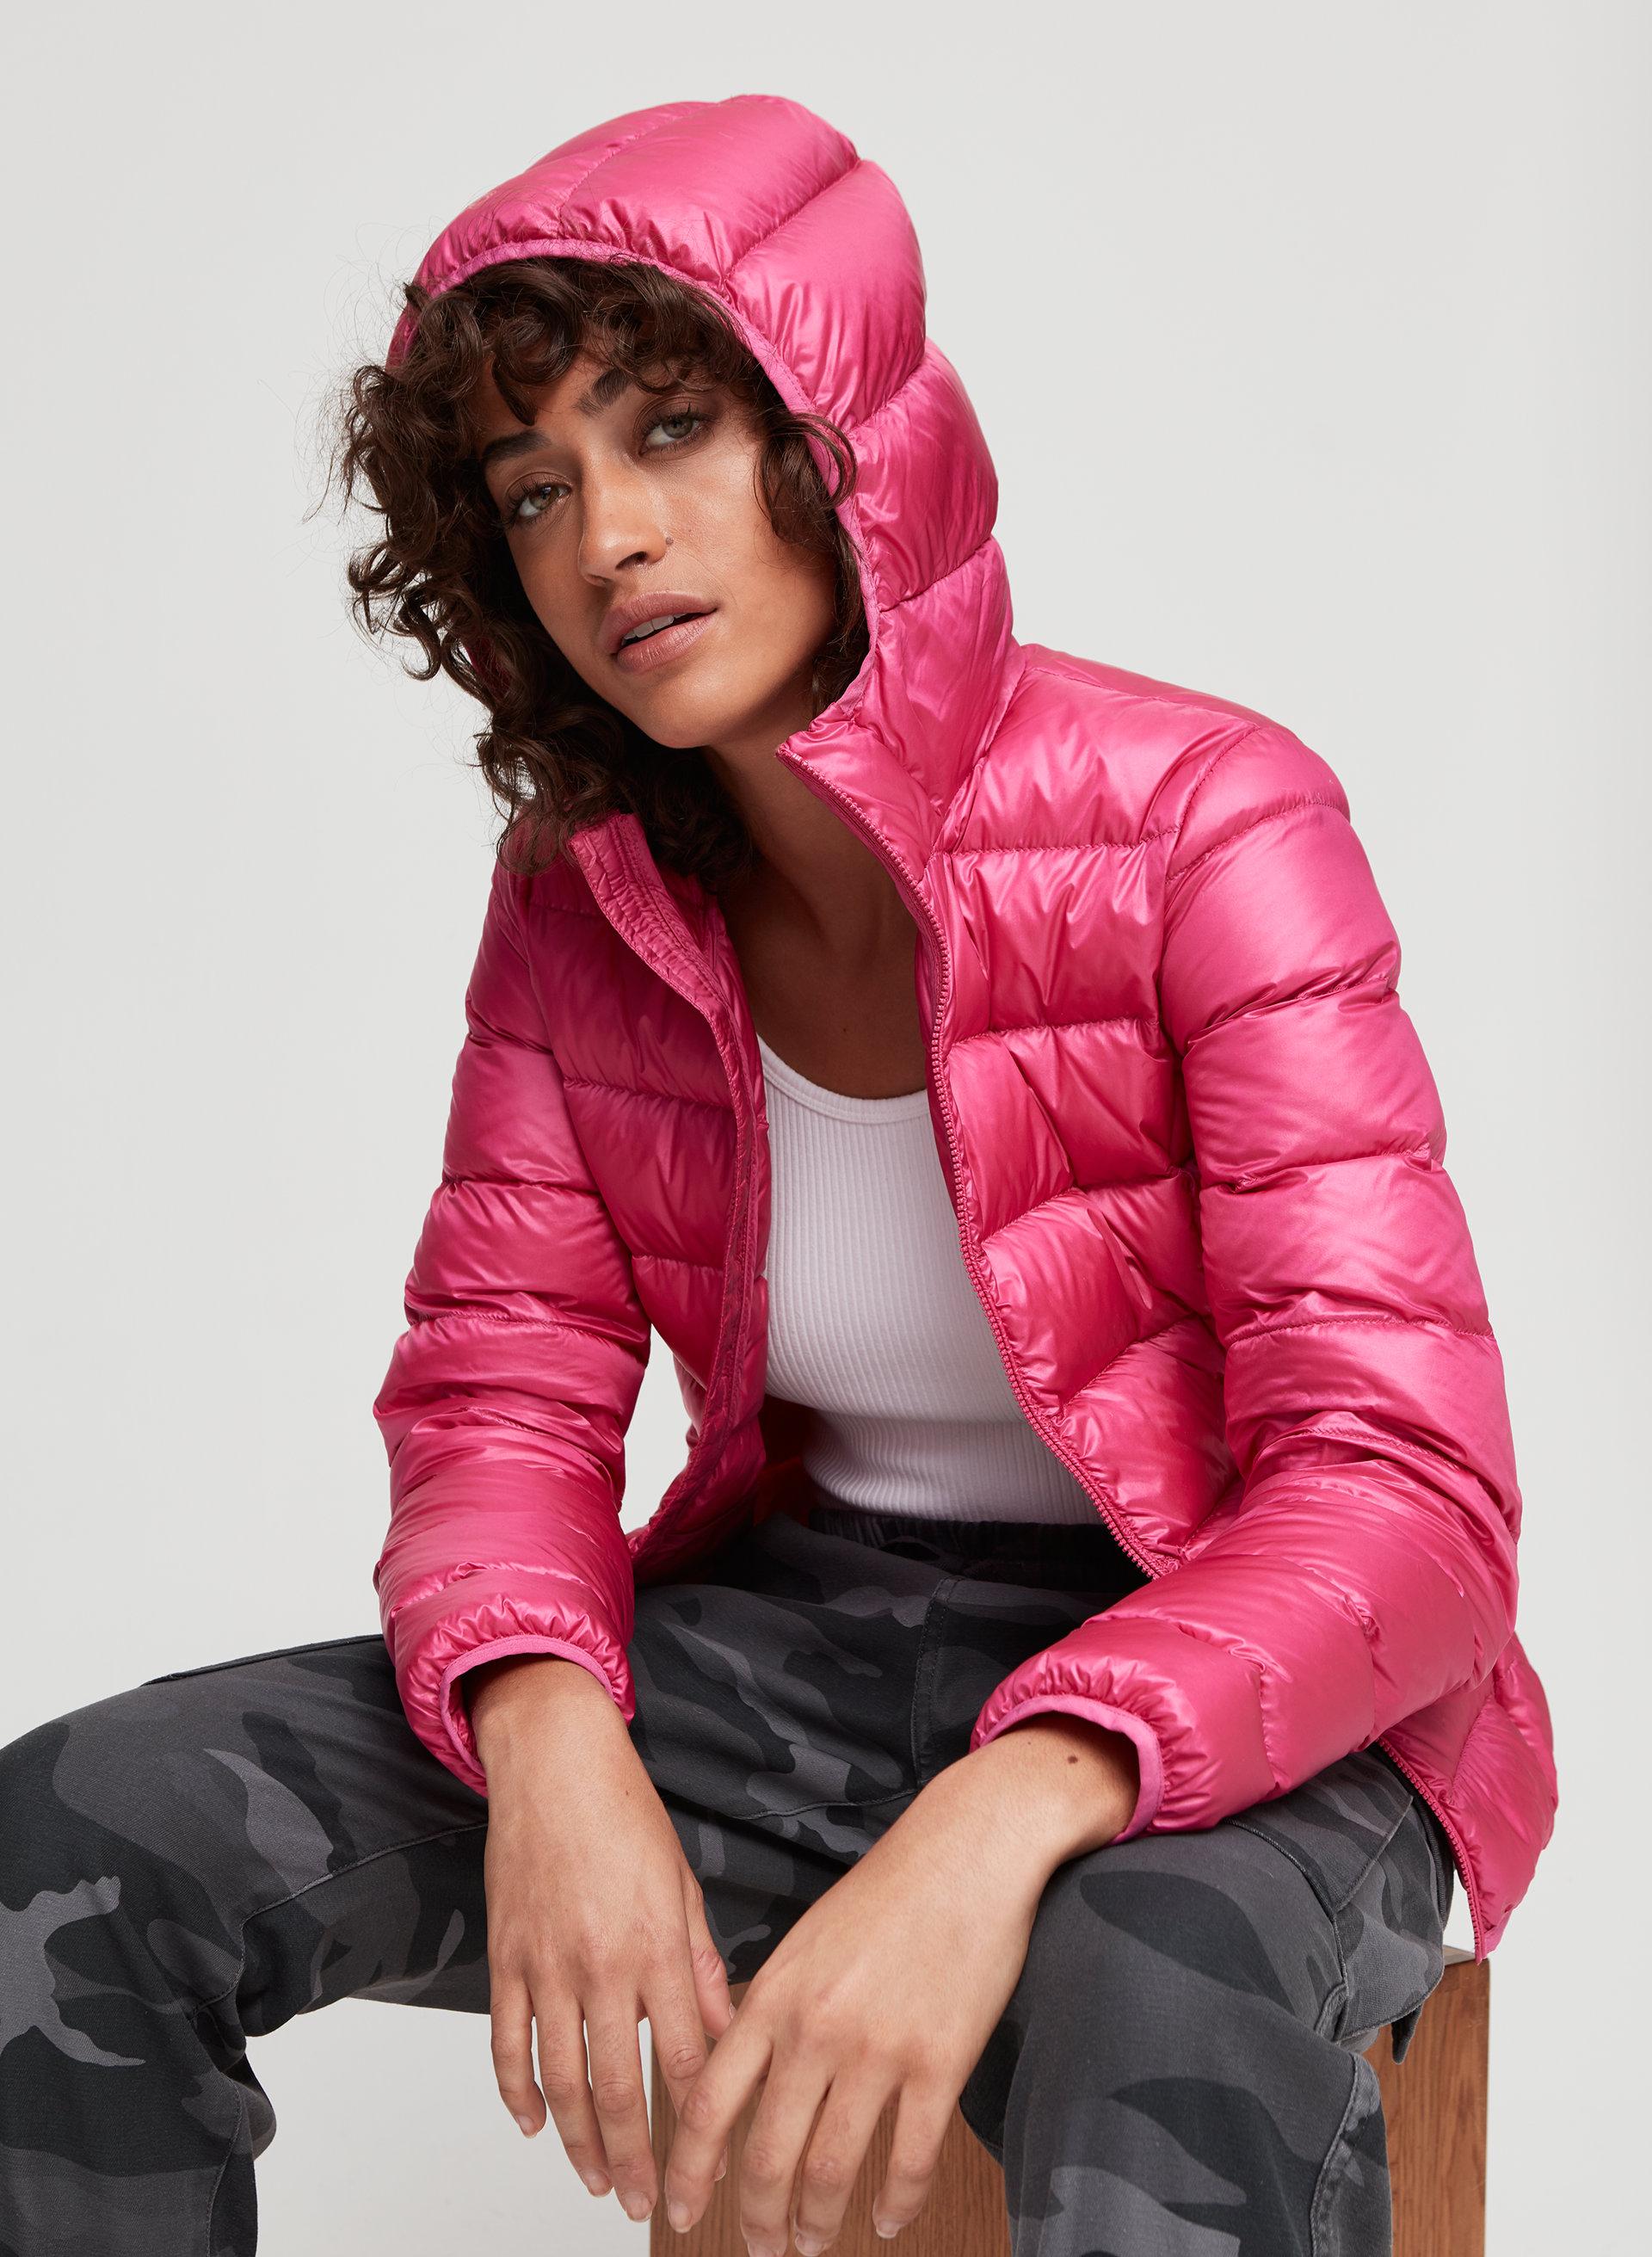 47a27d9dffb3 THE LITTLE PUFF - Packable, goose-down puffer jacket